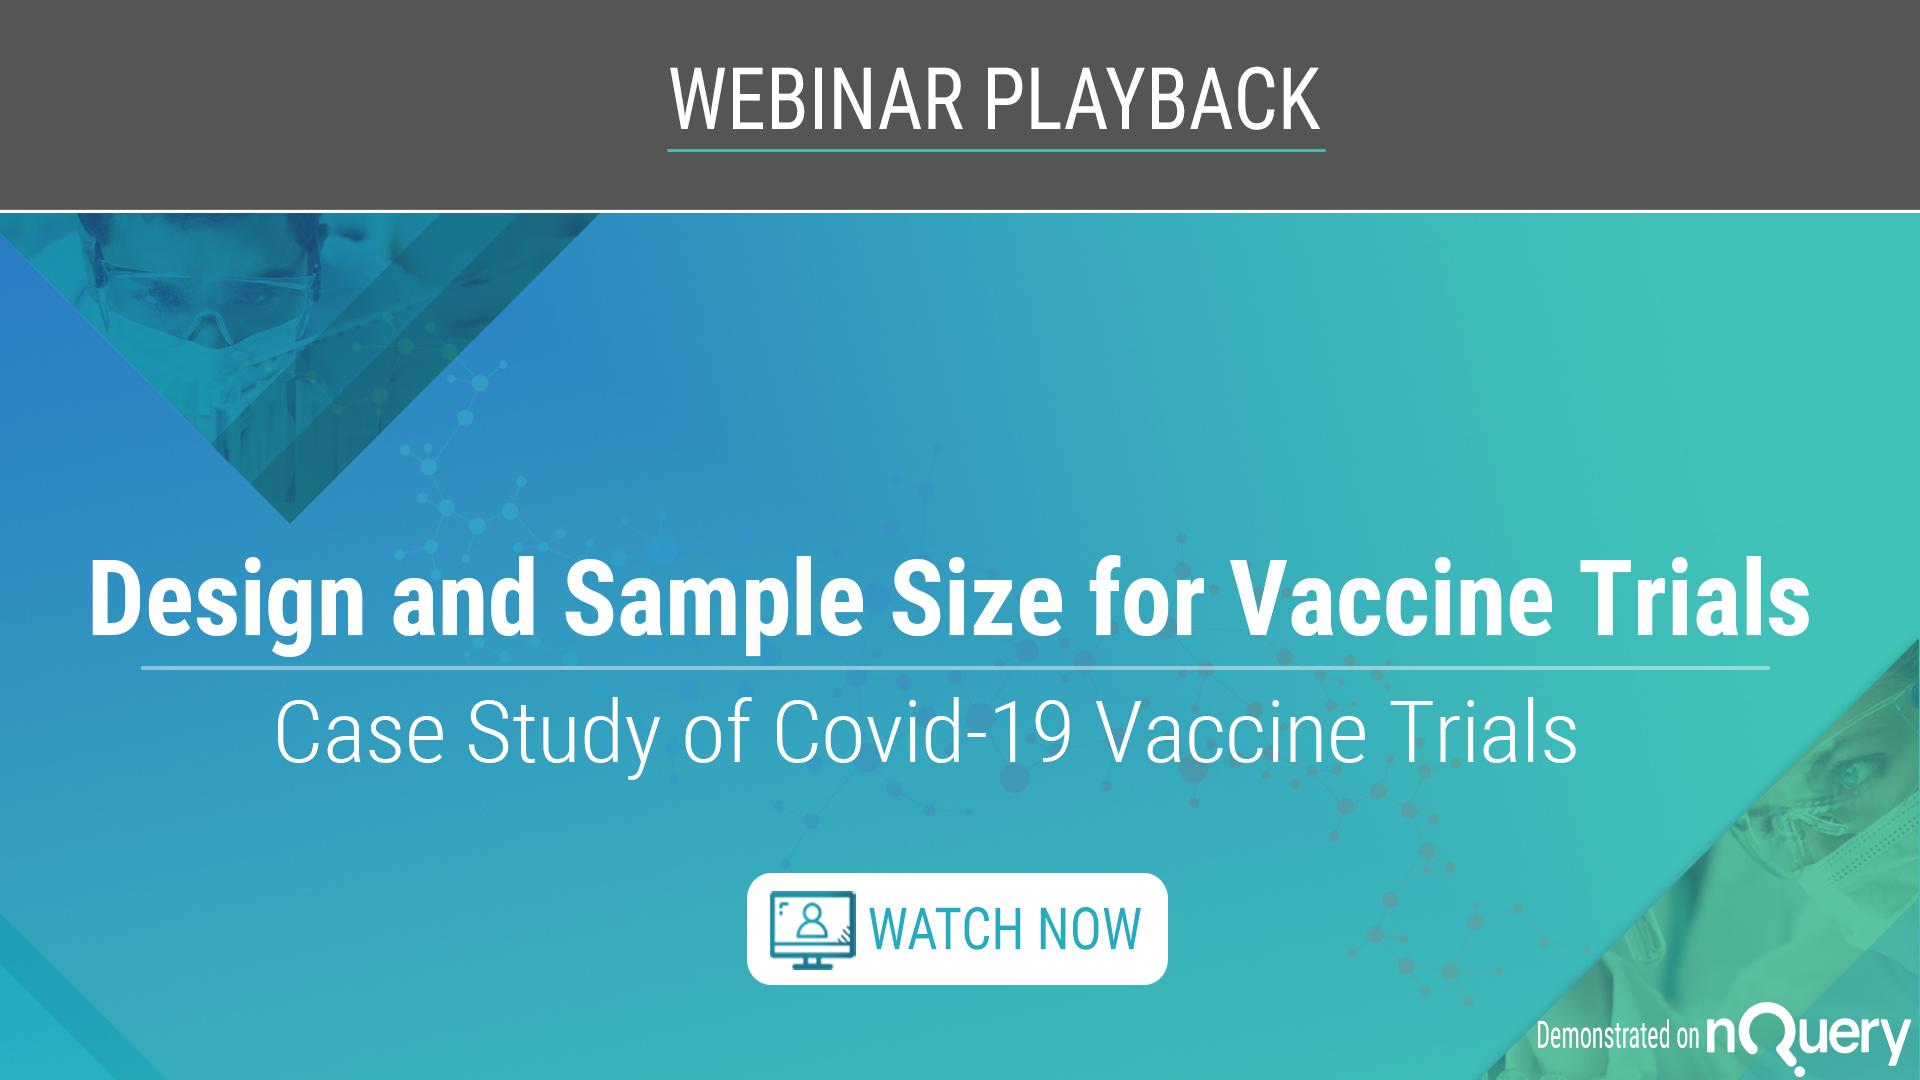 Case-Study-of-Covid-19-Vaccine-Trials-On-Demand